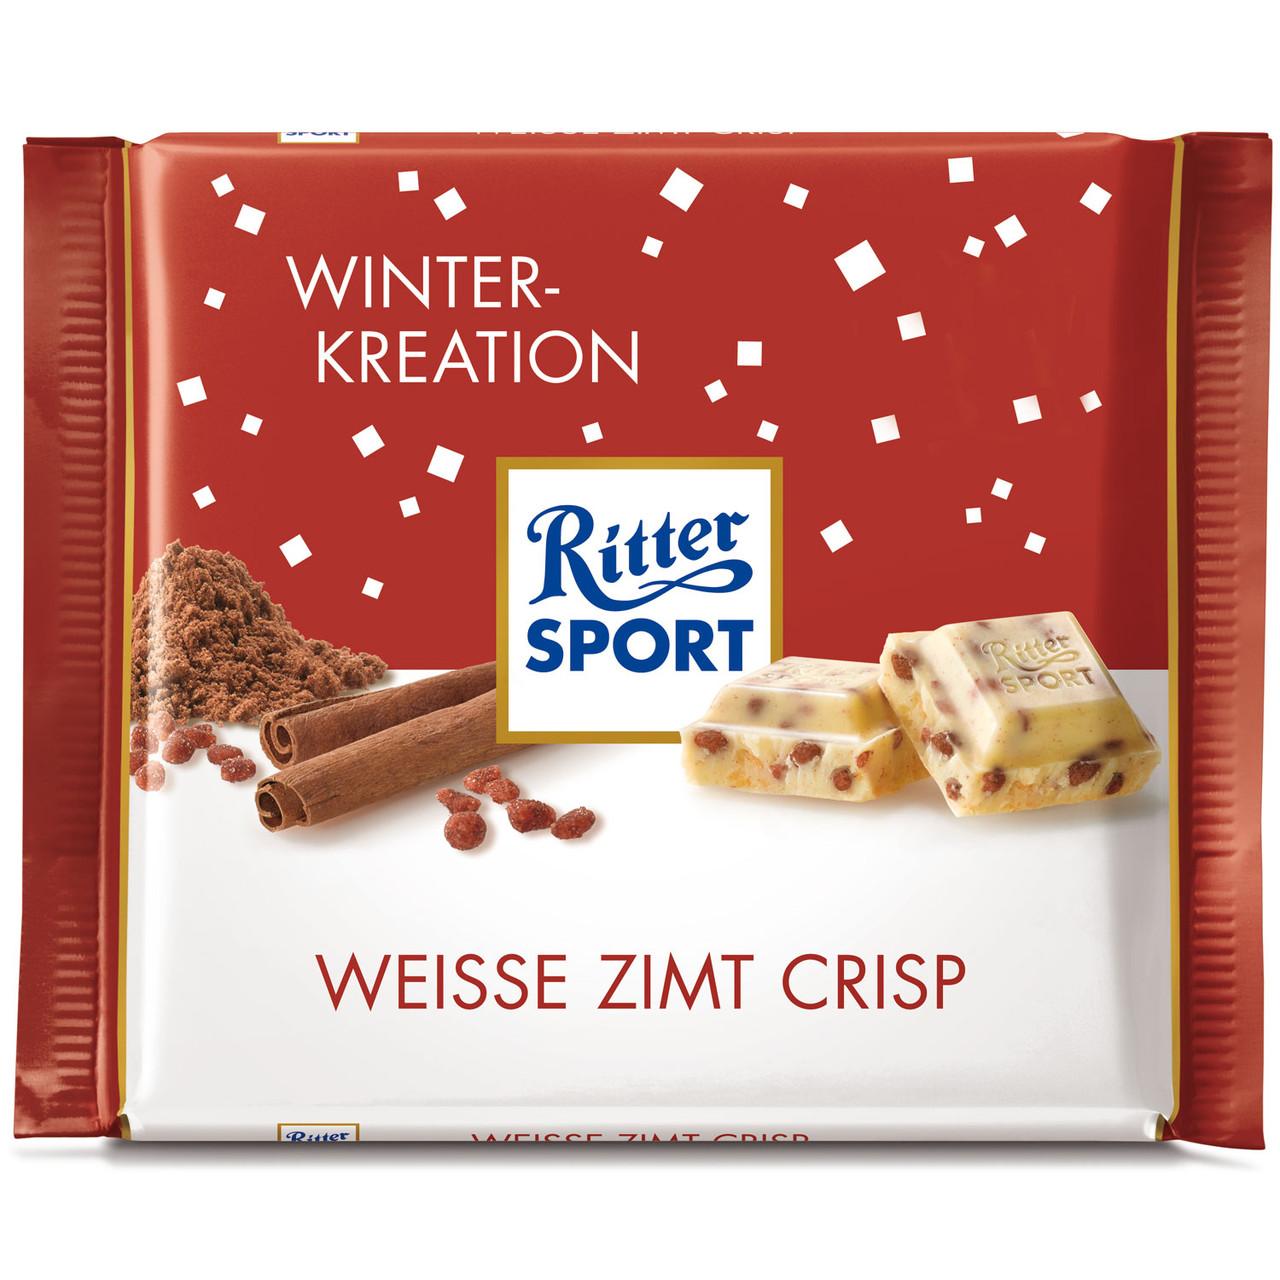 Шоколад Ritter Sport Weisse Zimt Crisp (Риттер Спорт миндаль в карамели), 100 г